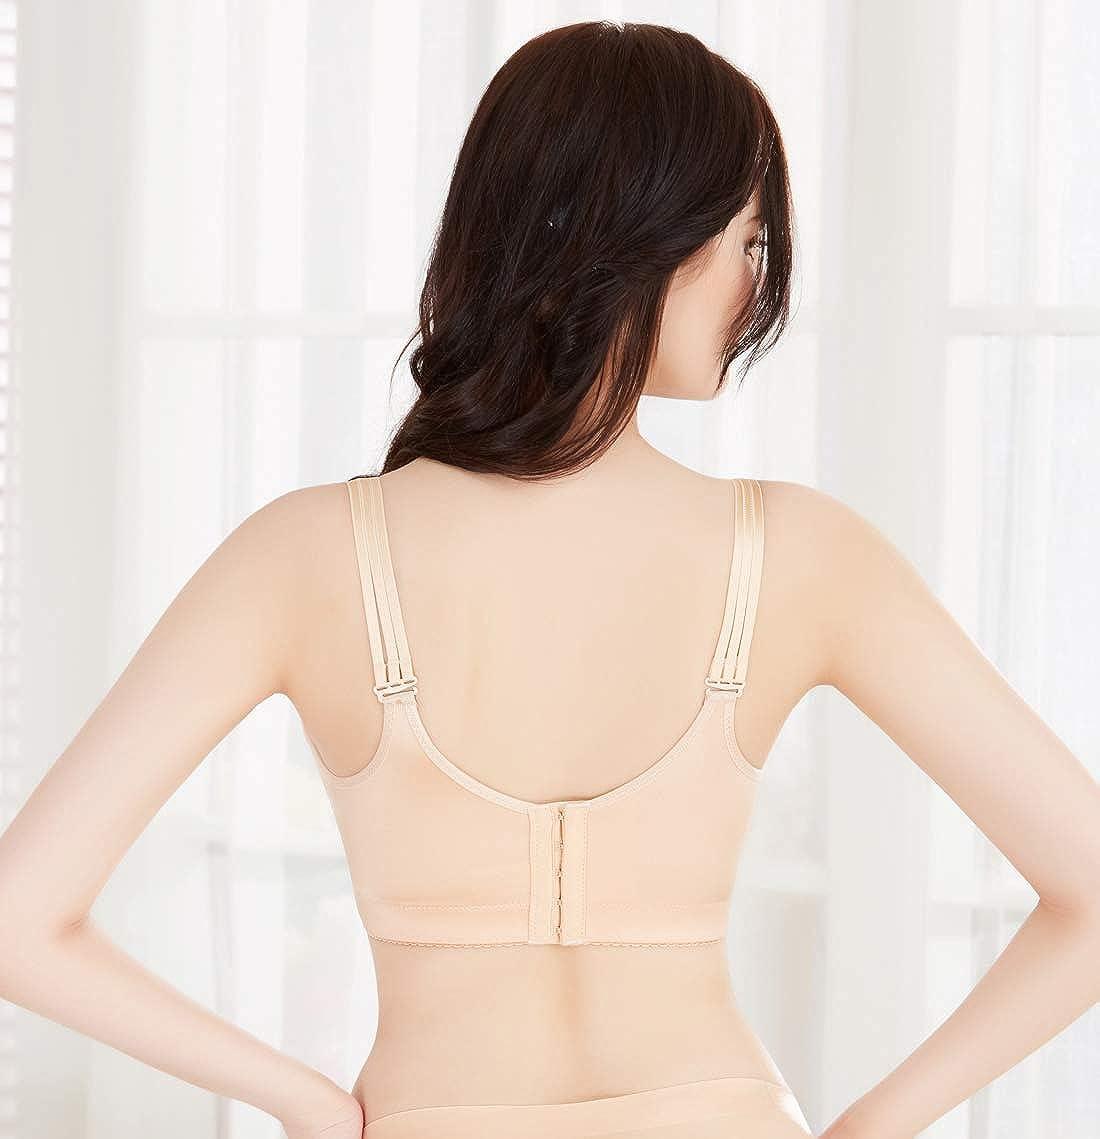 8e7dd869c4 DOOSINKI Women Wire-Free Plus Minimizer Bras Push Up Drawstring Bras with  Extender  Amazon.ca  Clothing   Accessories